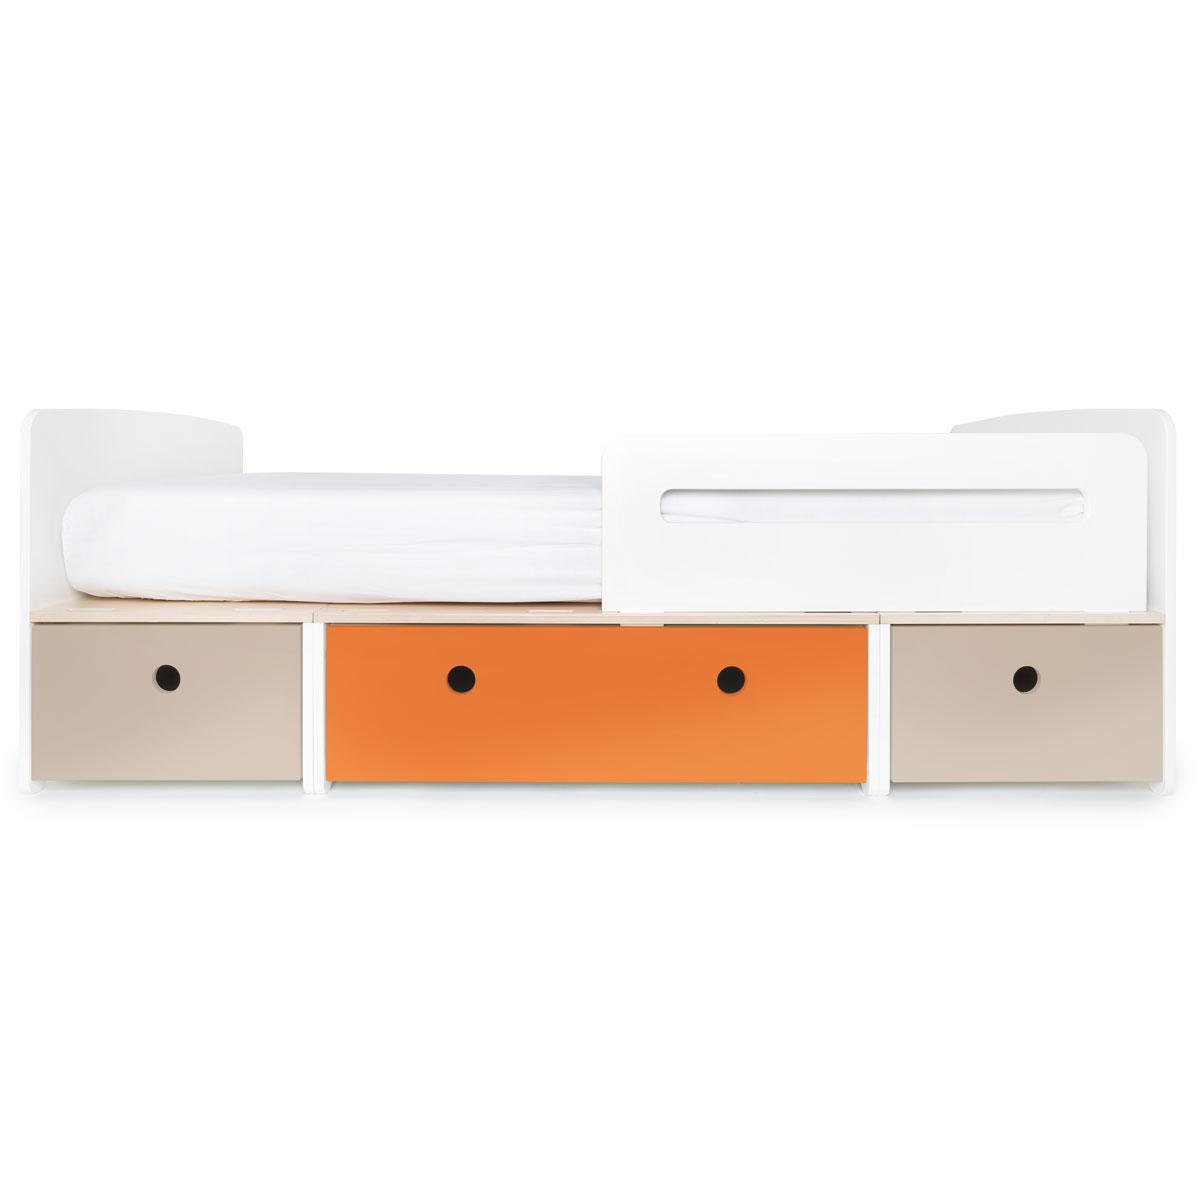 Cama evolutiva 90x200cm COLORFLEX Abitare Kids warm grey-pure orange-warm grey